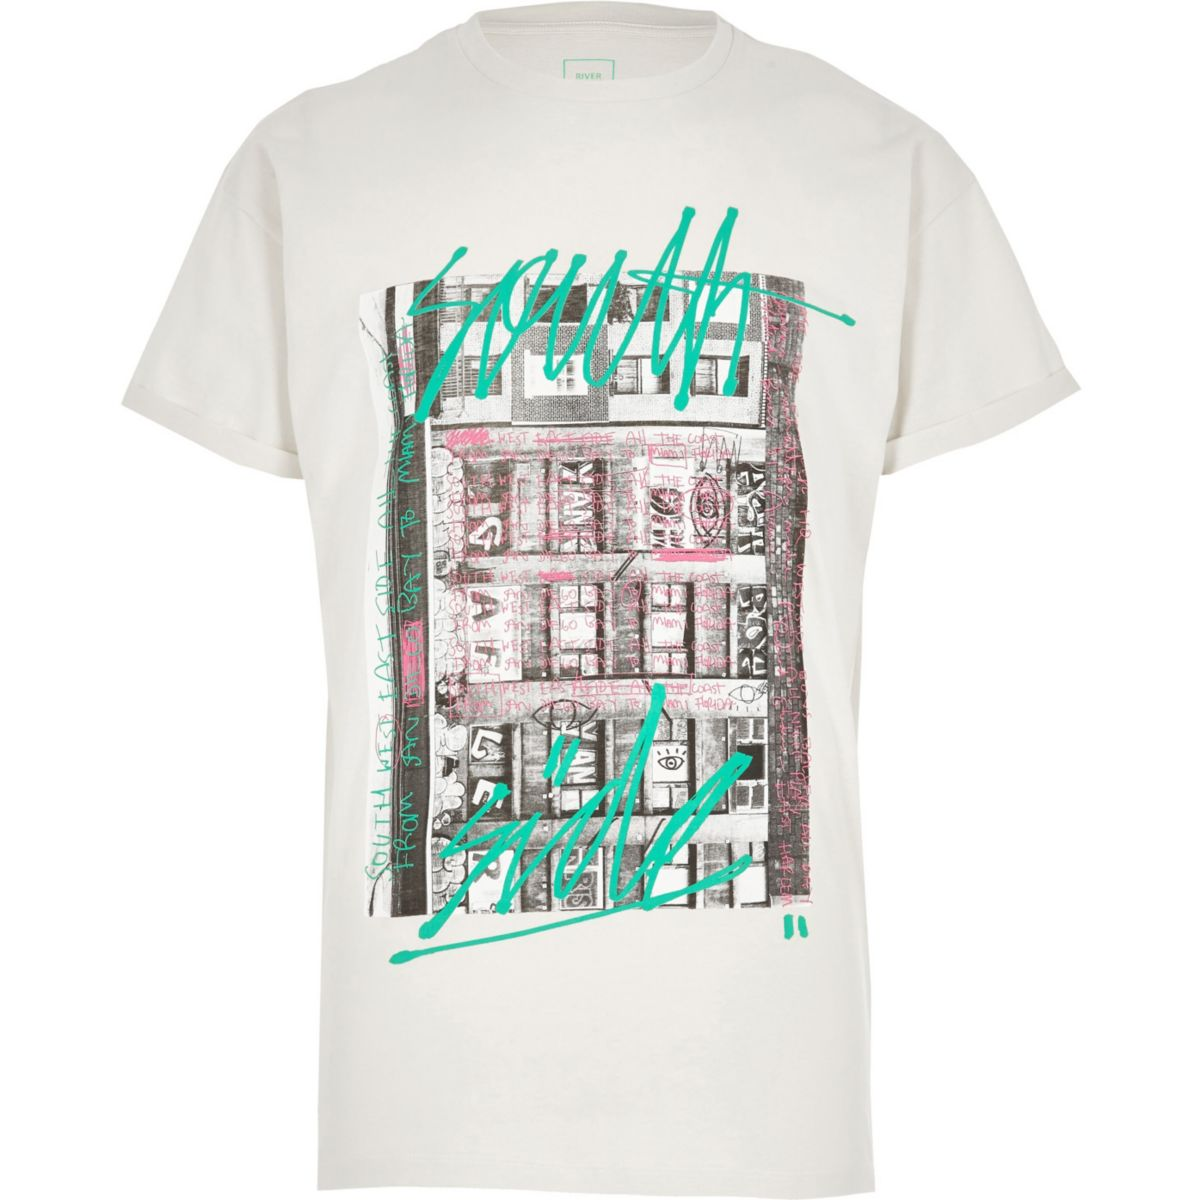 Cream graffiti print short sleeve T-shirt